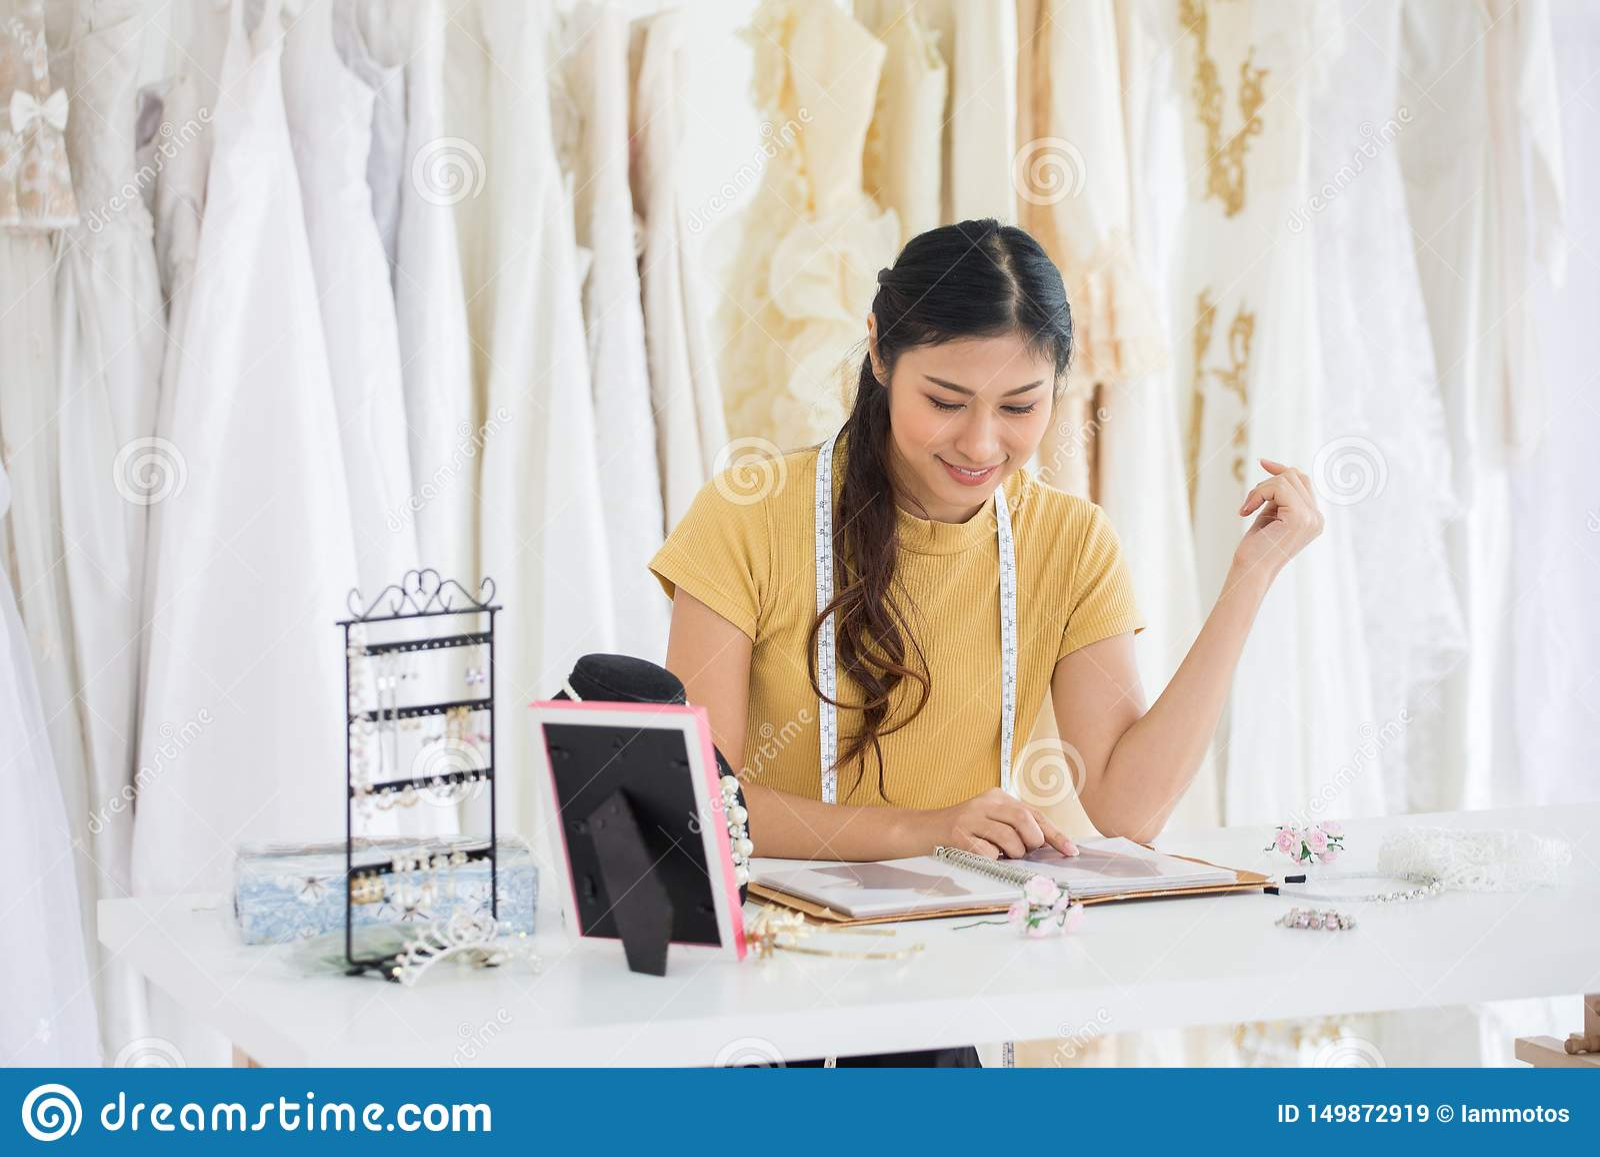 Wedding Dress Designer Working In Wedding Salon Of Fashion Store Stock Image Image Of People Clothing 149872919